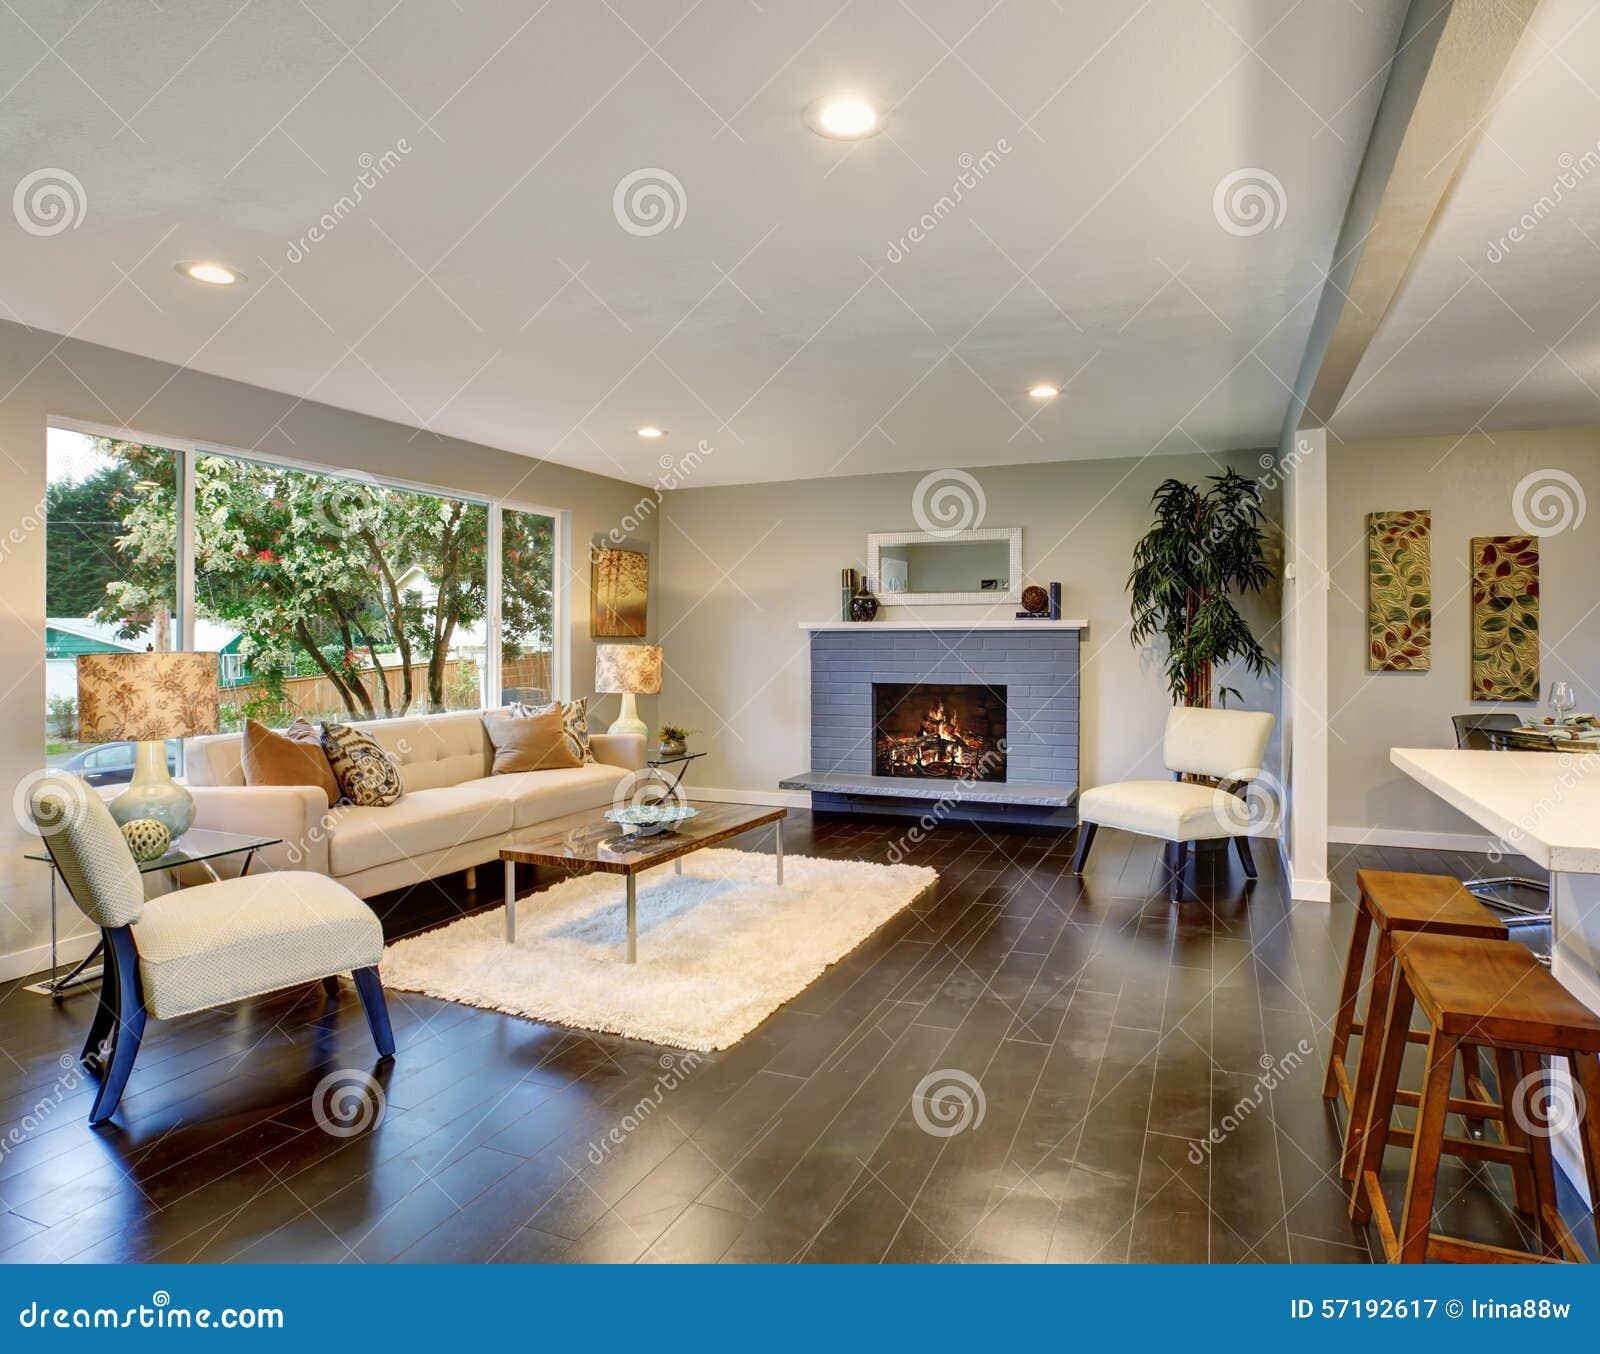 Modern Living Room With Dark Hardwood Floor Stock Image Image Of Beautiful Estate 57192617